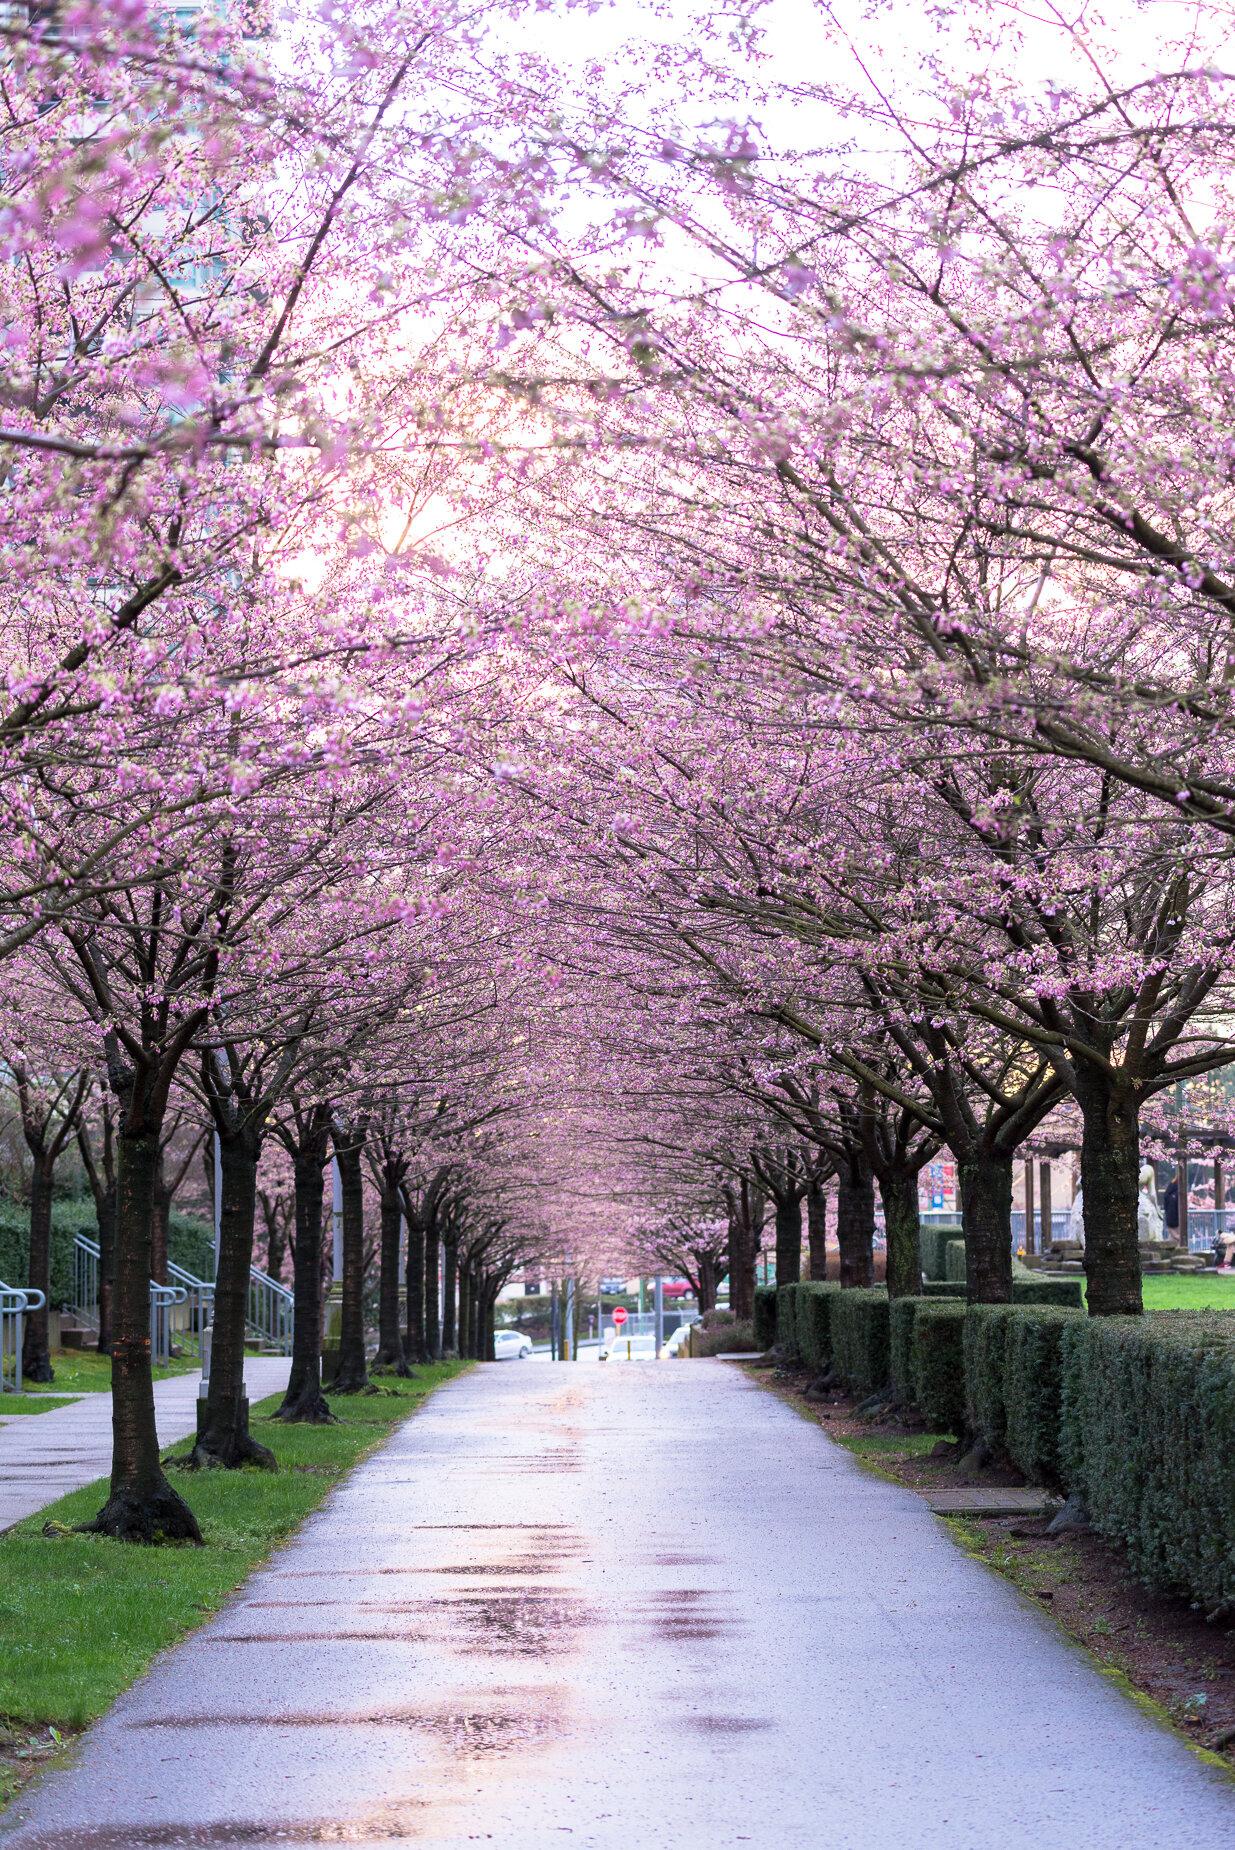 Plum Cherry Blossoms In Vancouver Vanexus Photography Vancouver Landscape Photographers